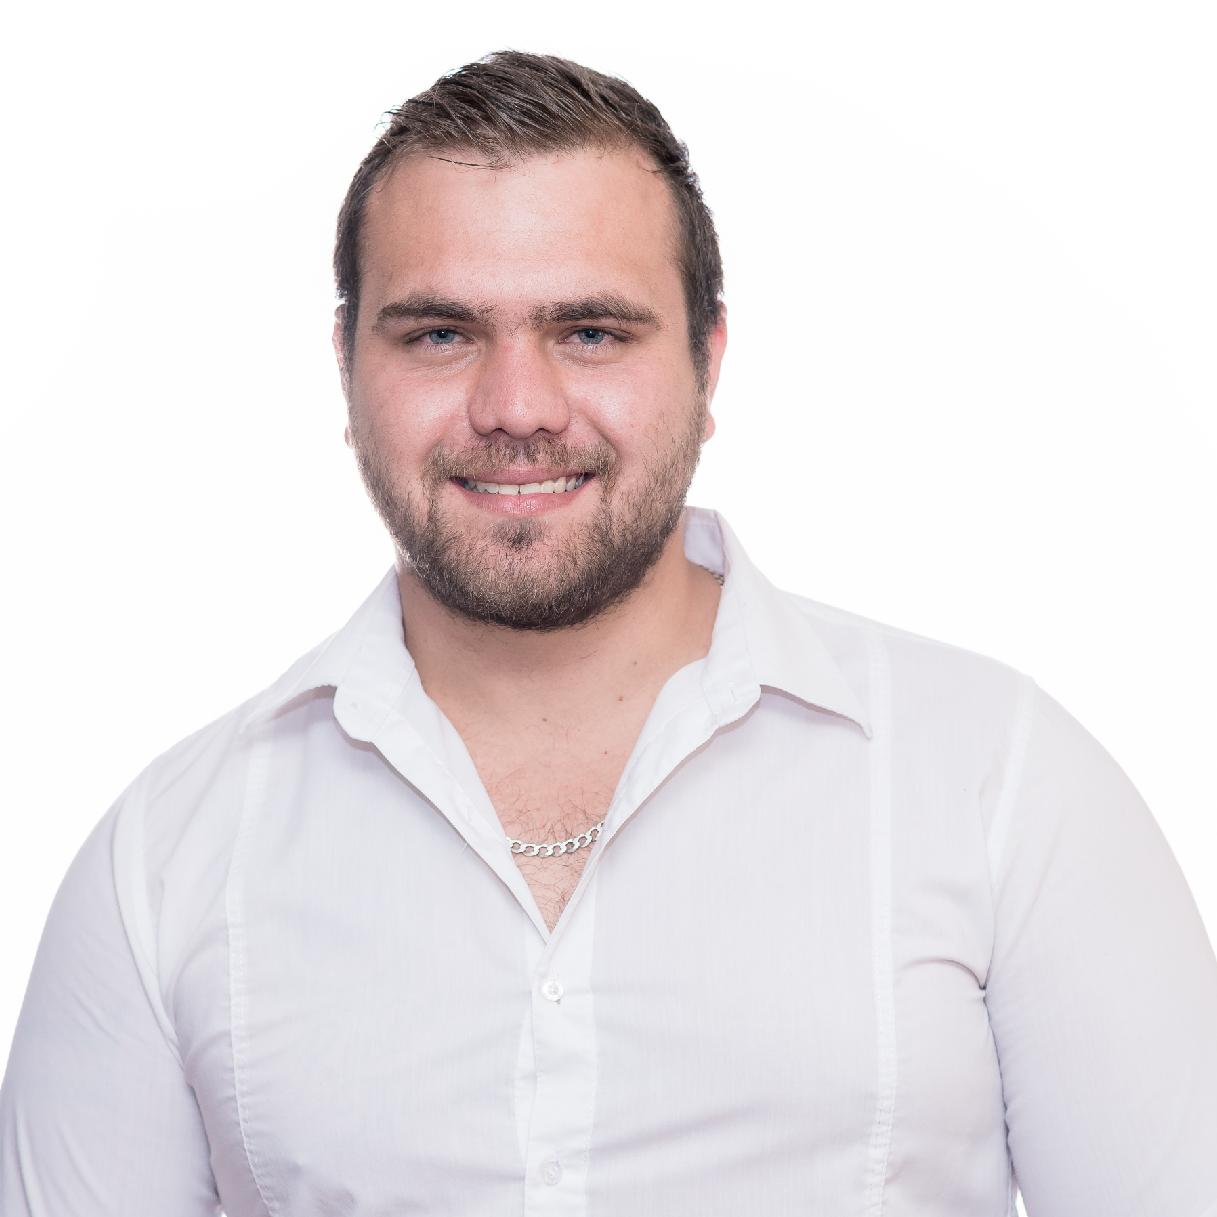 Heine Pretorius